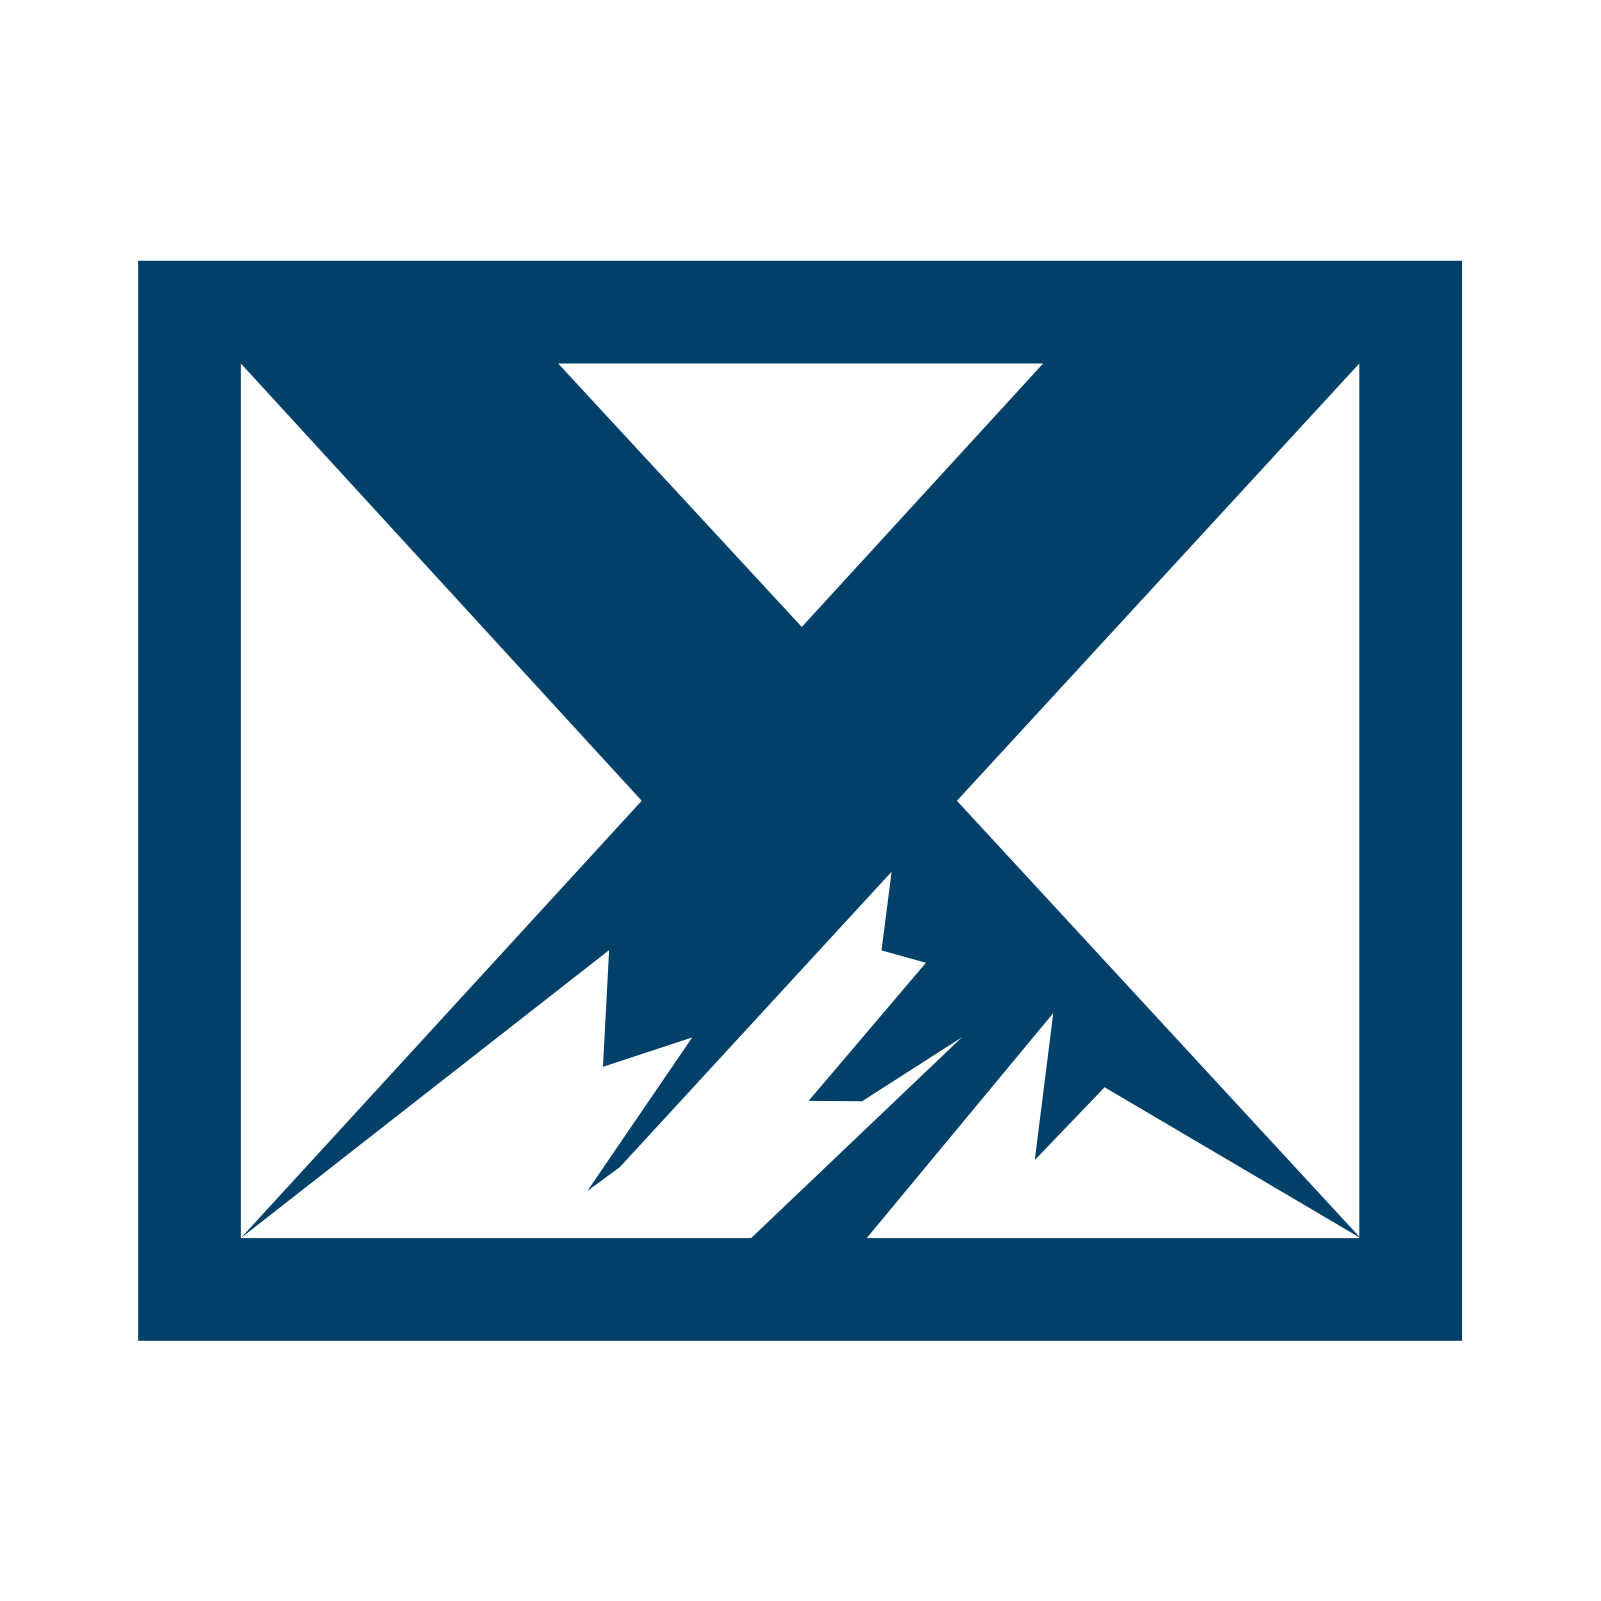 X Sports rebranding an outdoor mountain sports store